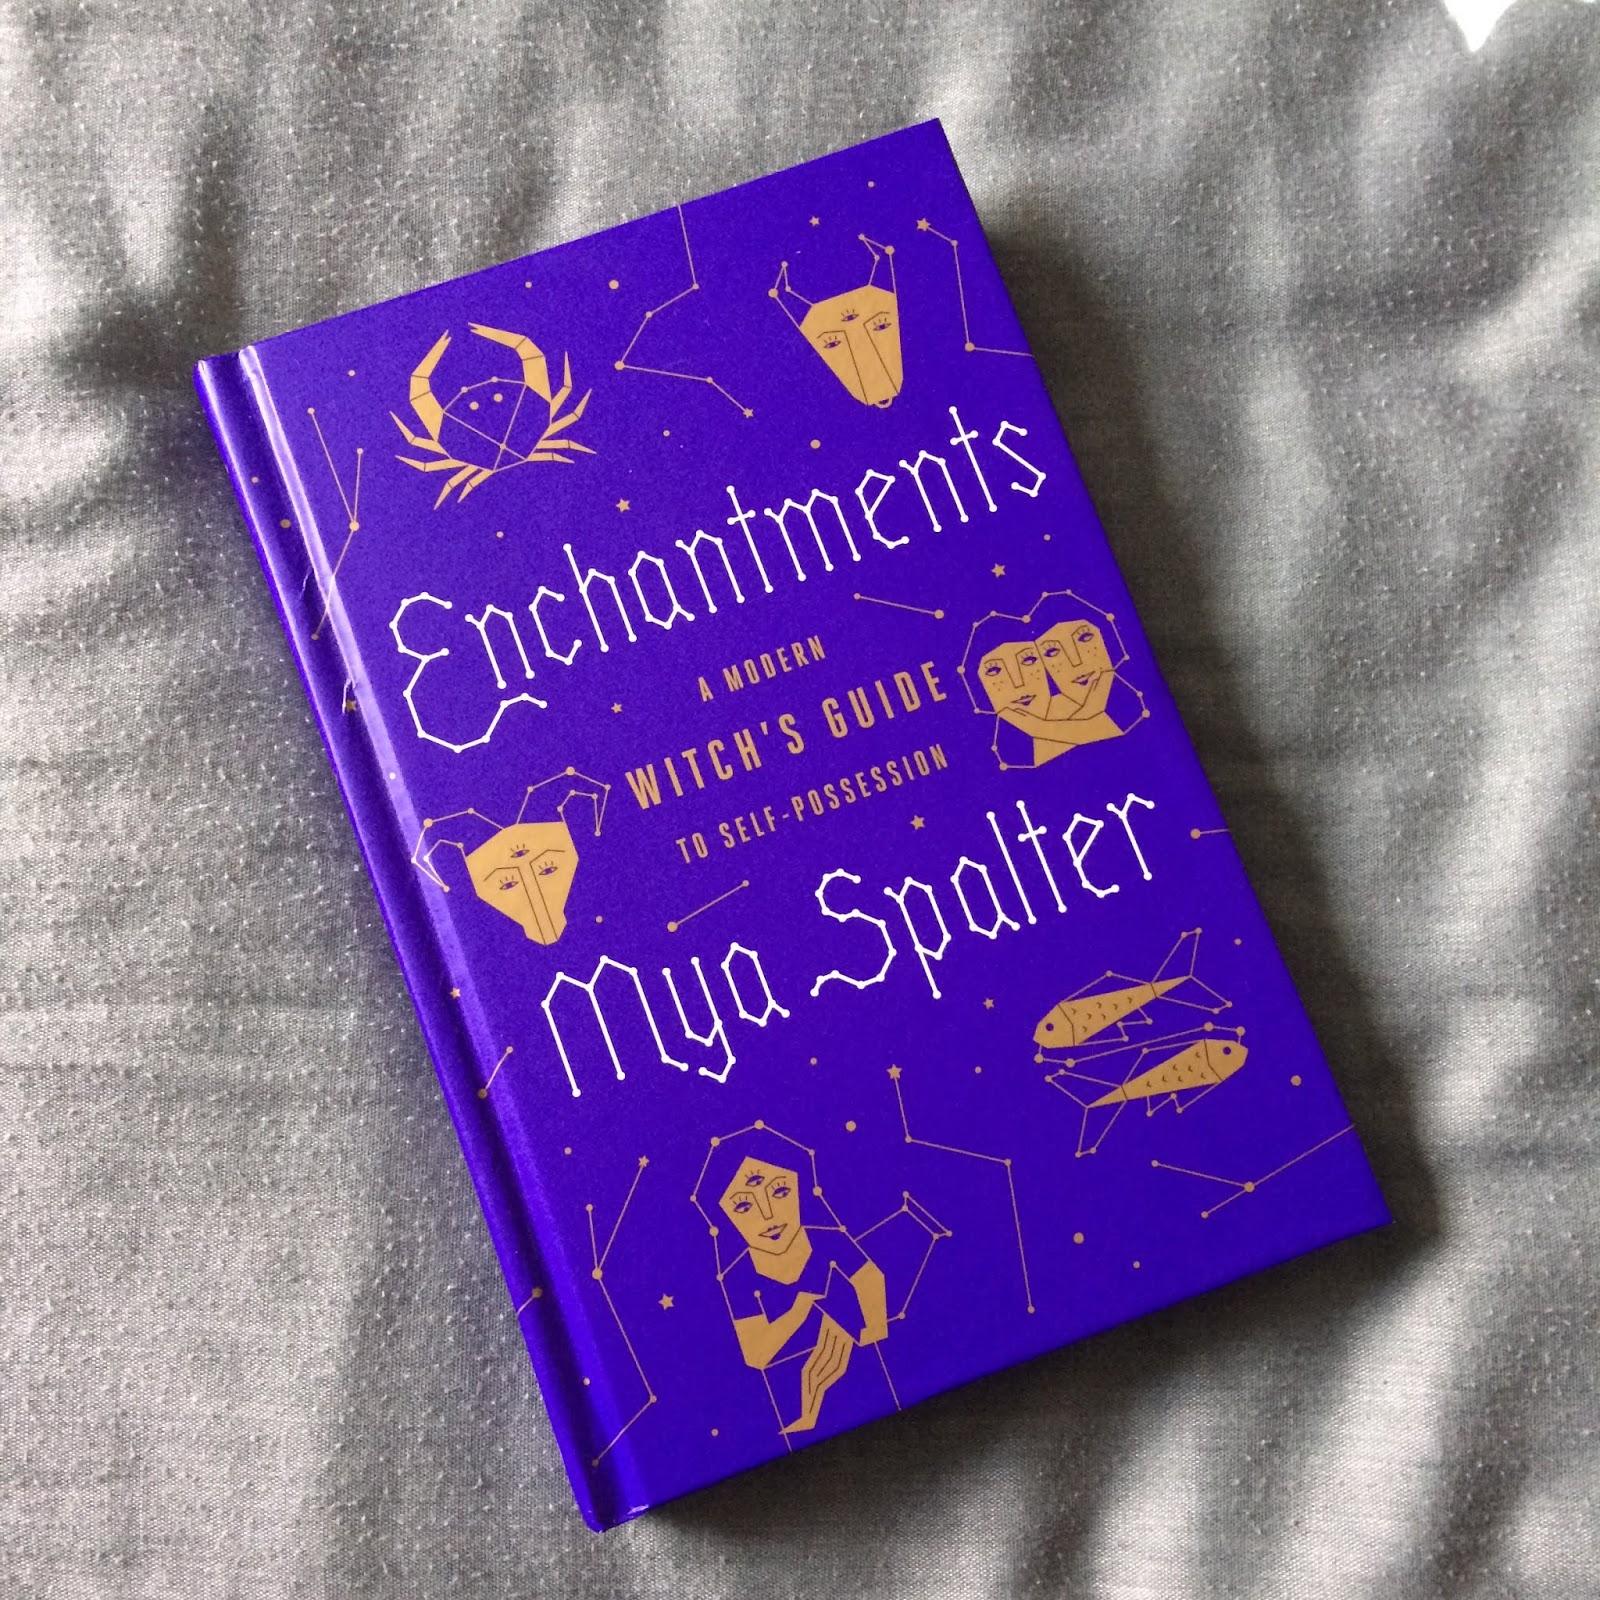 Enchantments by Mya Spalter